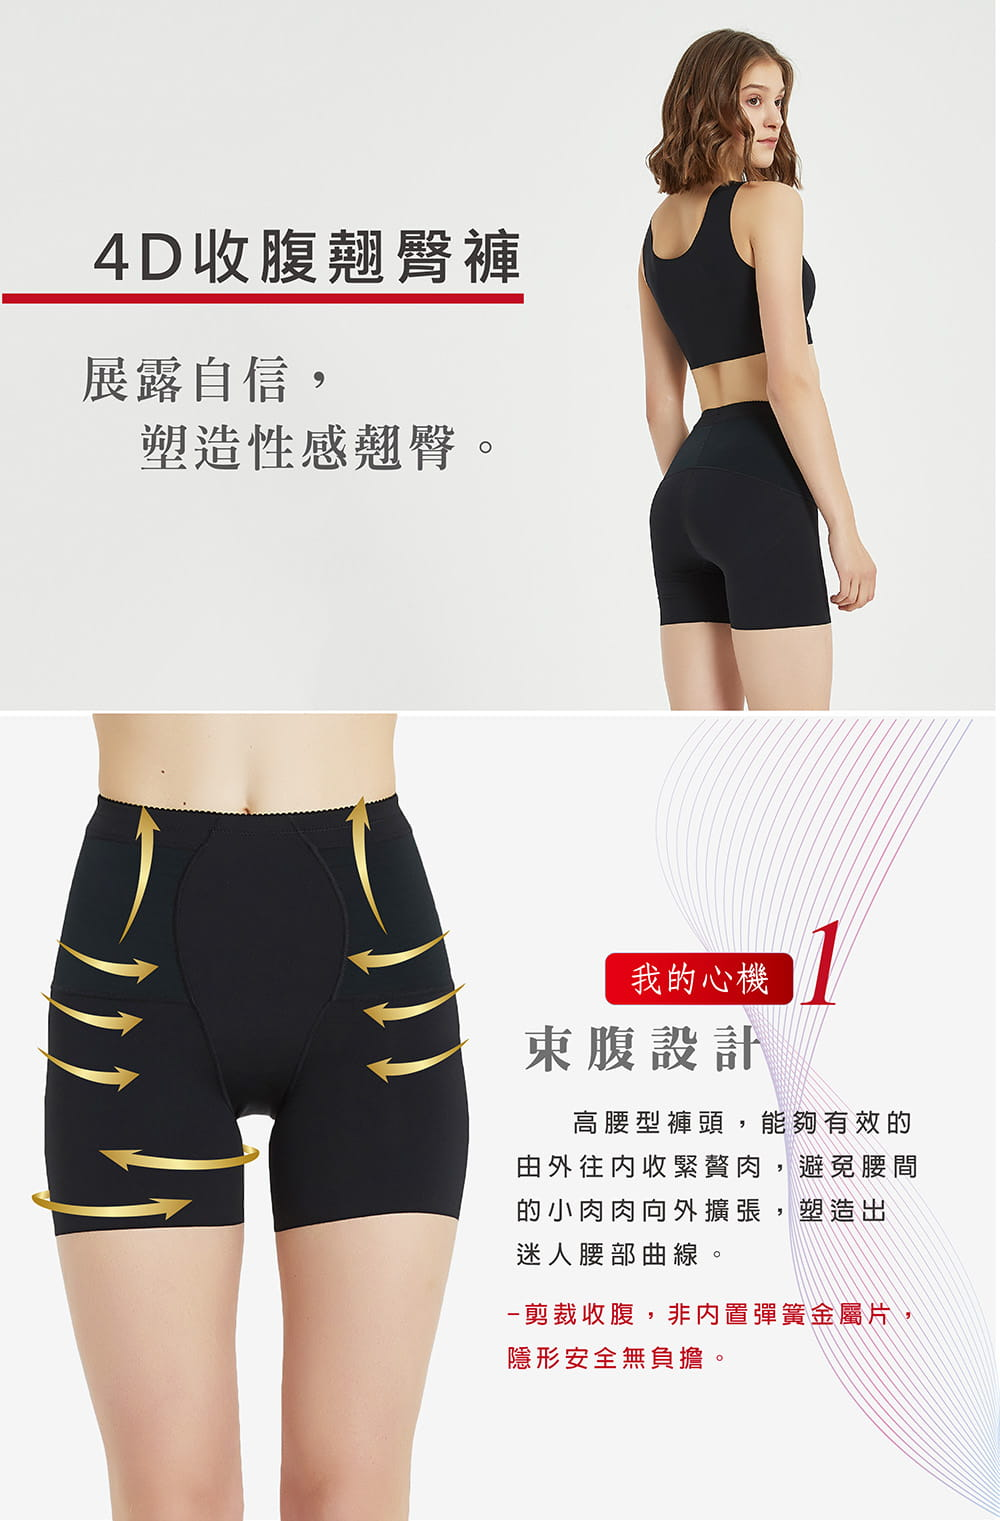 【MARIN】台灣製-4D收腹翹臀褲(提臀褲) 2